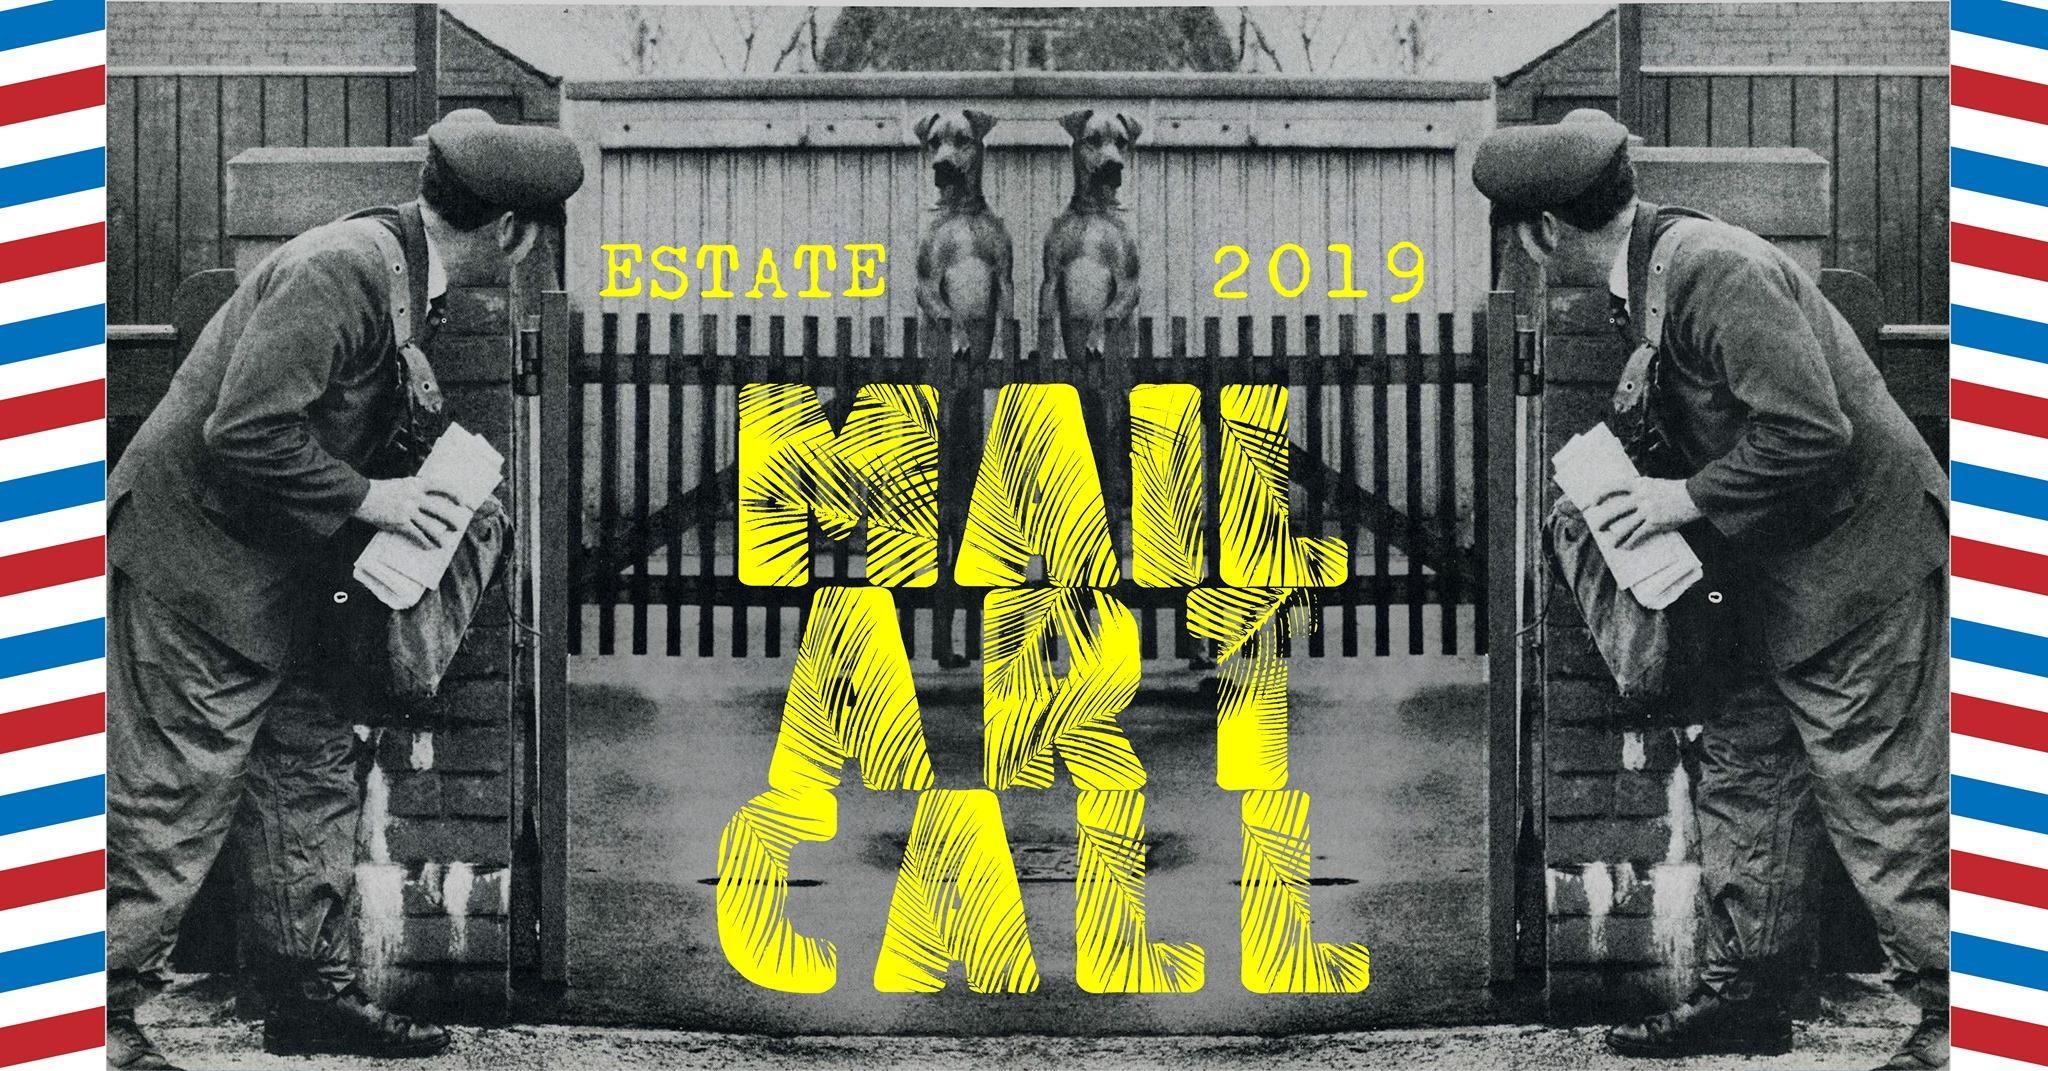 Cartolinea - Mail art call